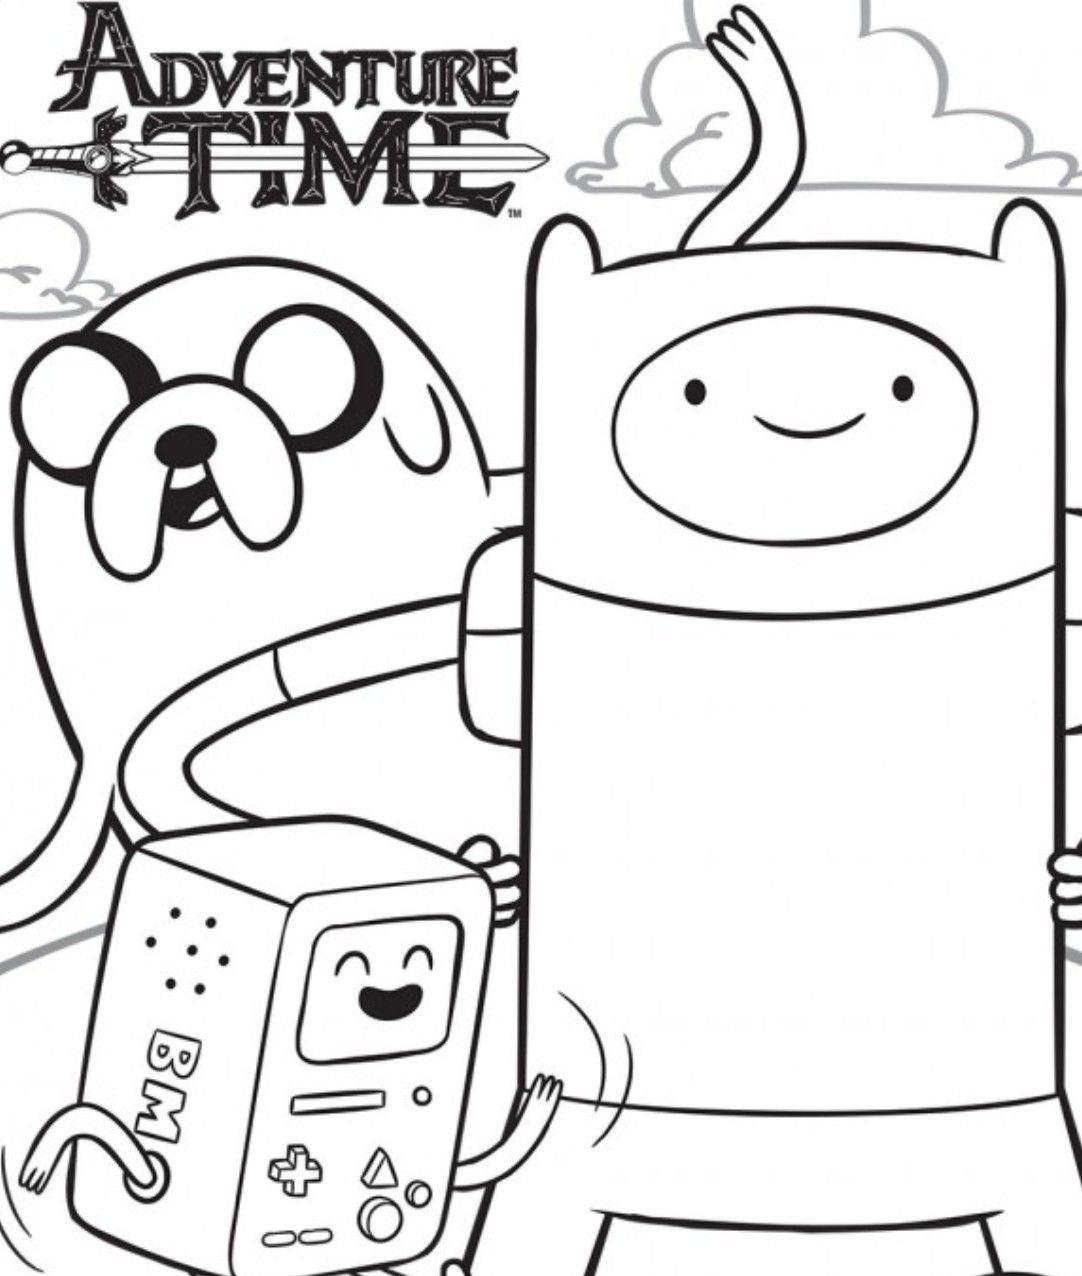 Adventure Time Coloring Pages Colorir Hora De Aventura Desenhos